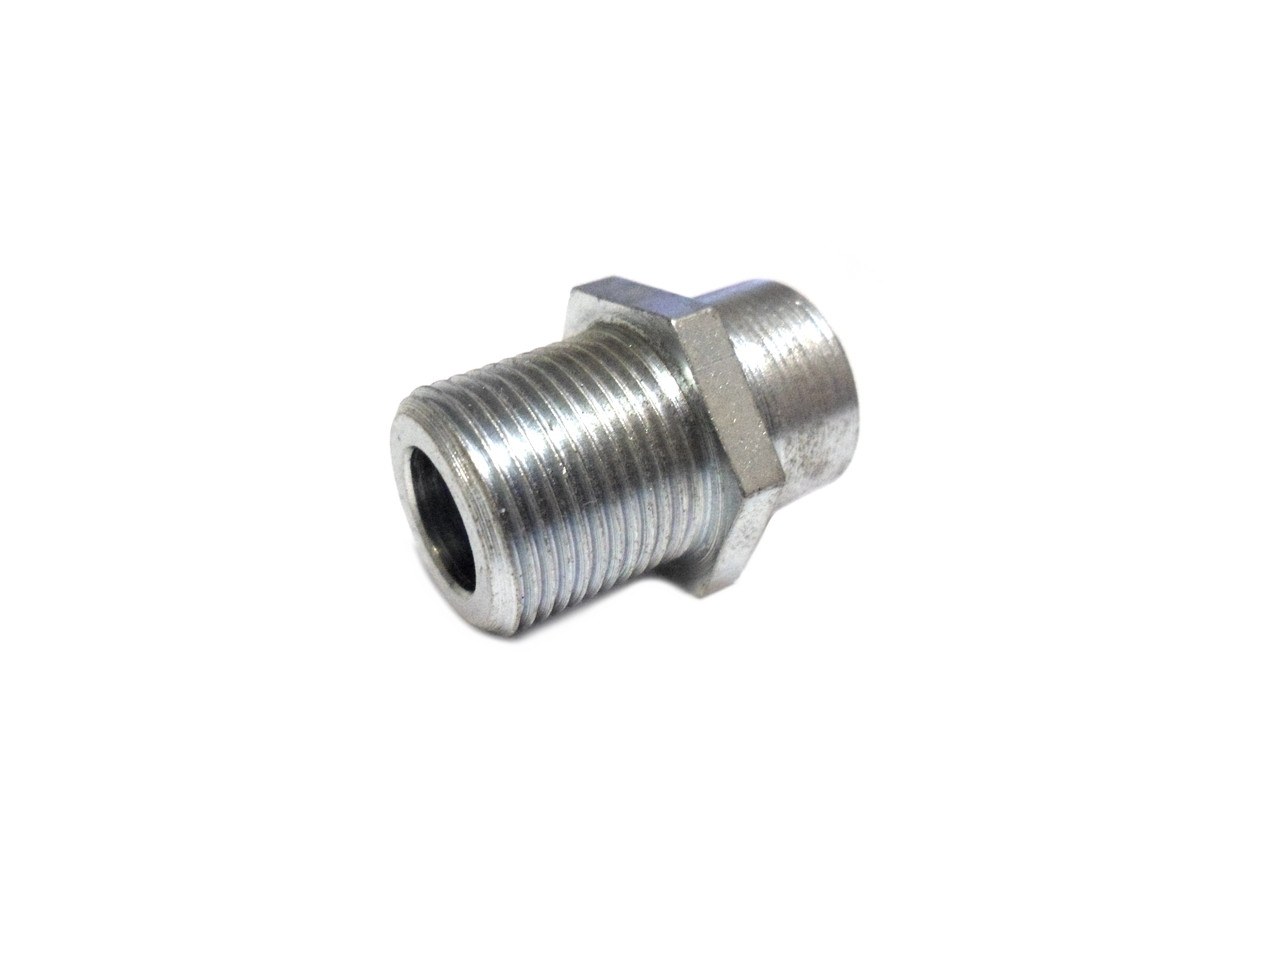 NOS Puch Za50 Starter Clutch Adjuster - Nut Only